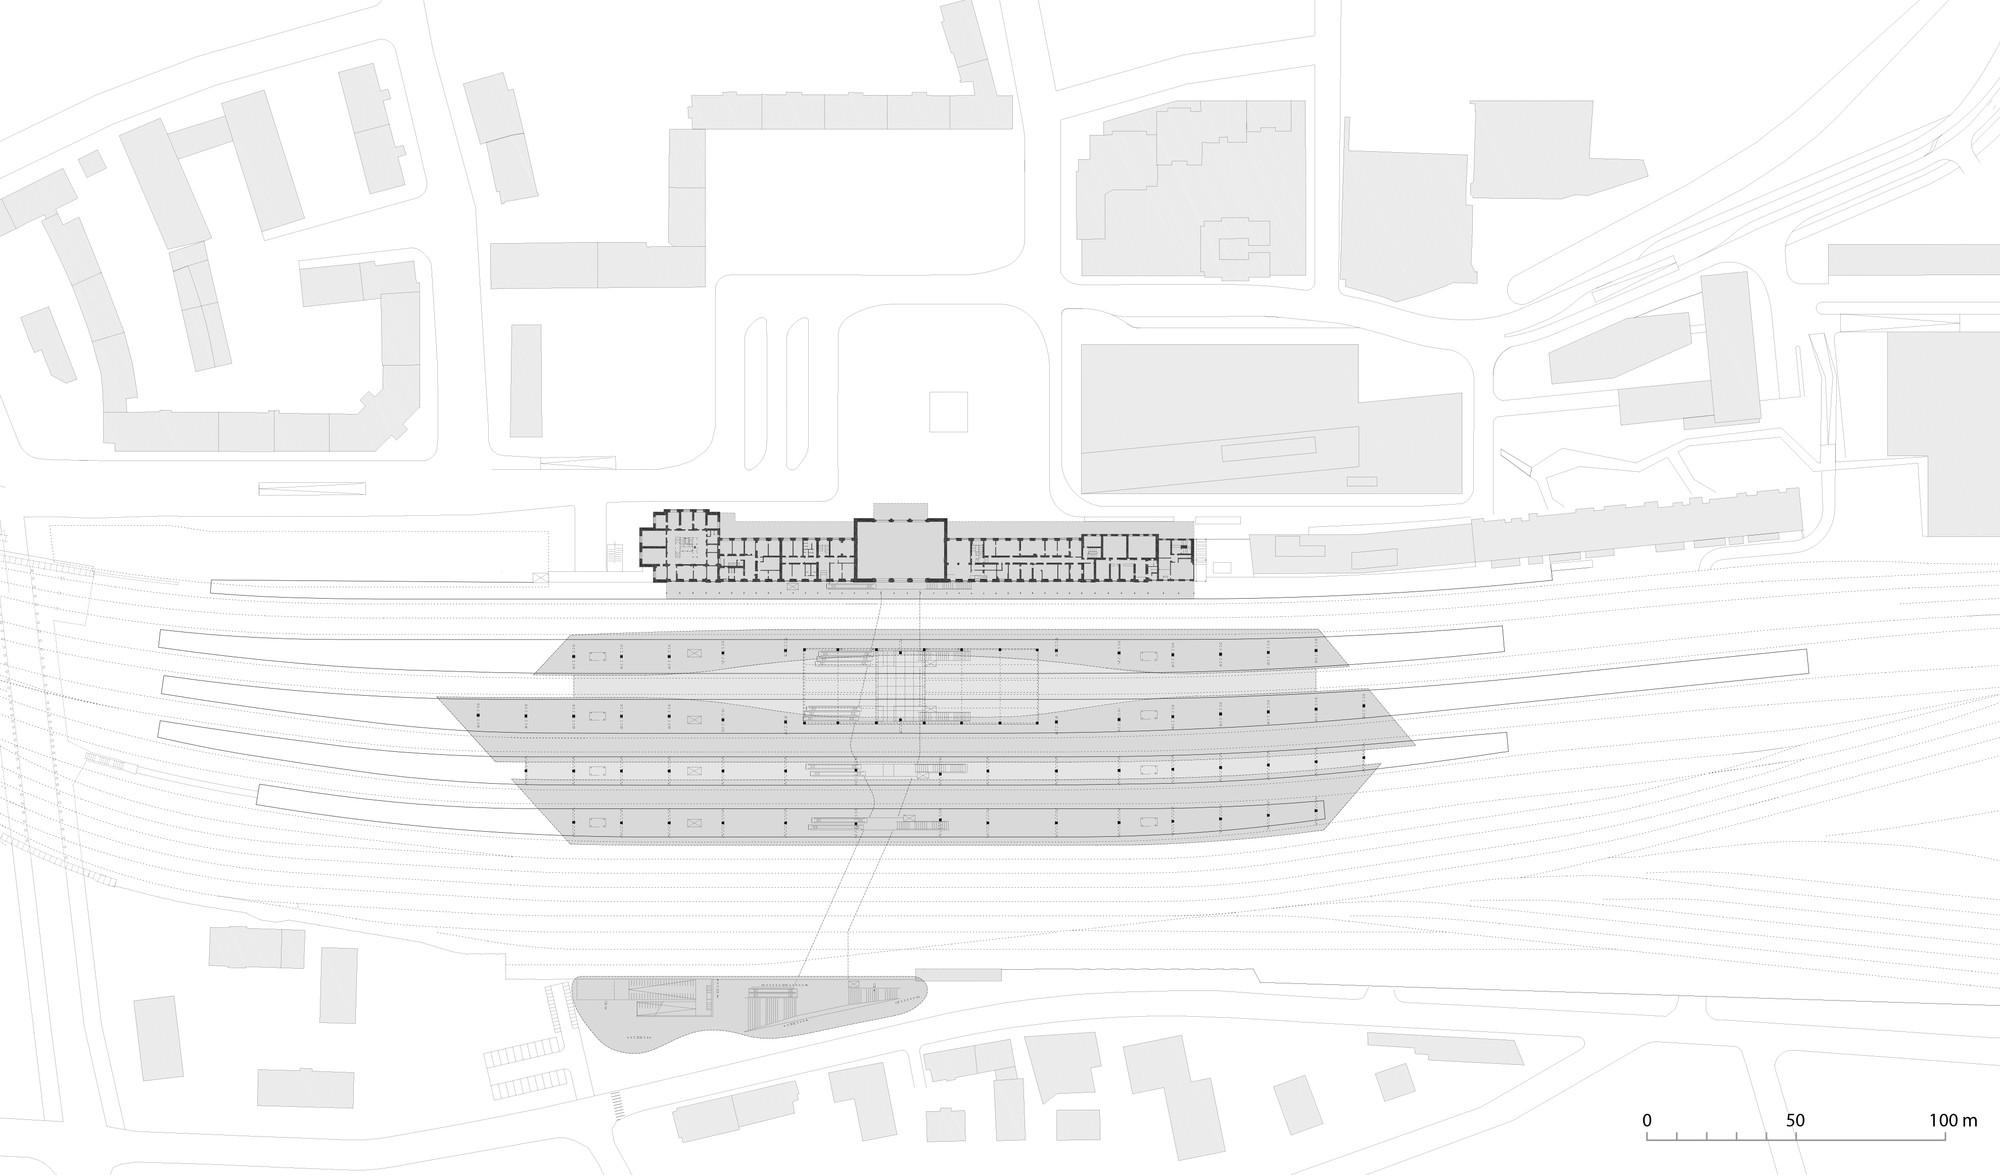 Central station salzburg kadawittfeld architektur - Architektur plan ...